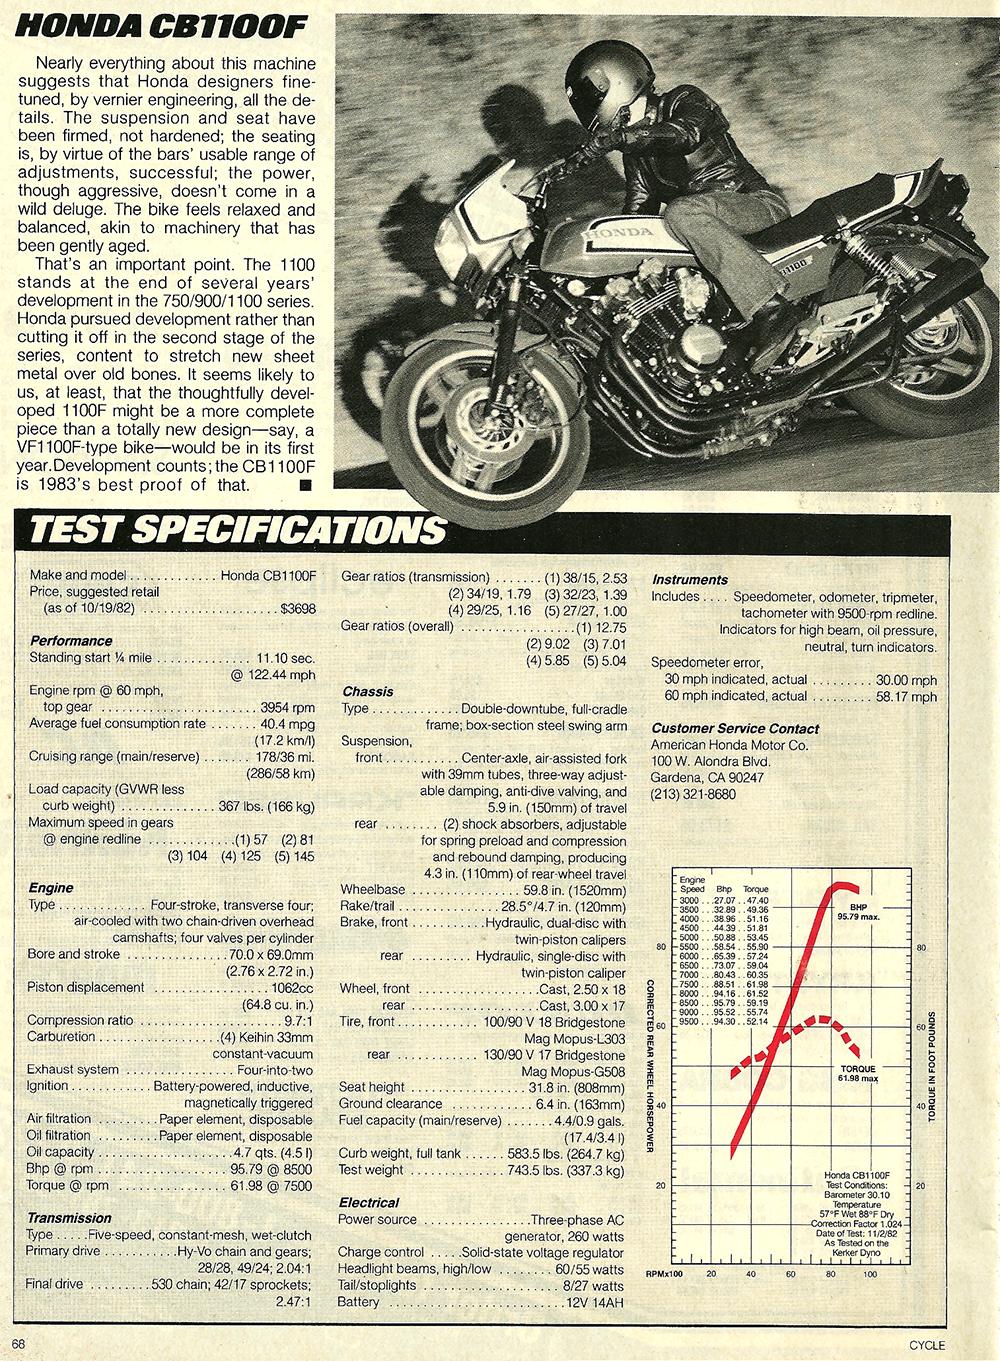 1983 Honda CB1100F road test 8.jpg